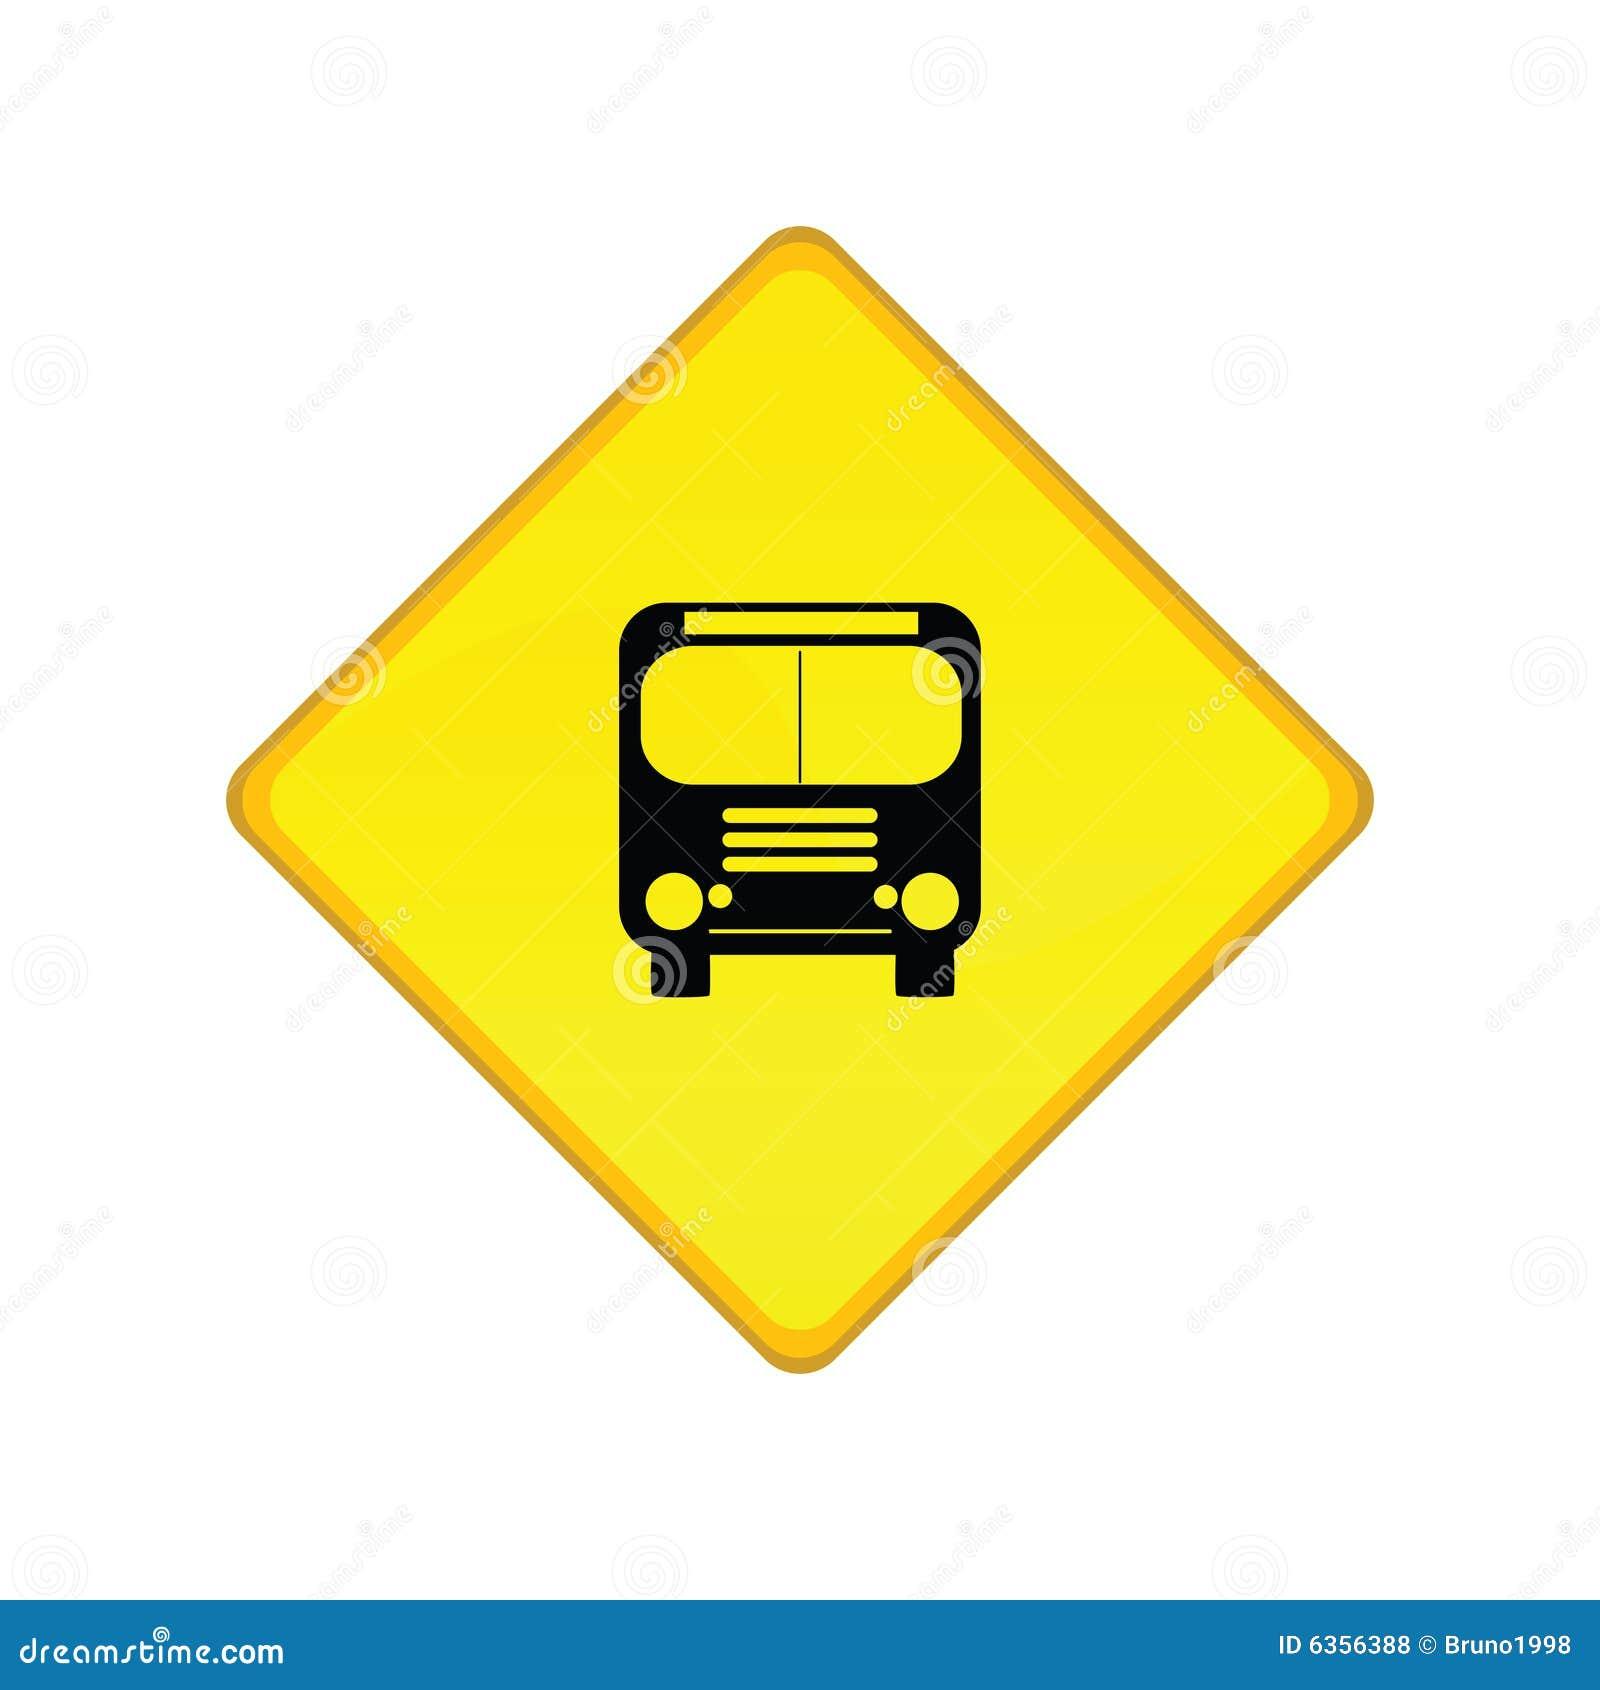 Bus Stop Sign Royalty Free Stock Photos Image 6356388